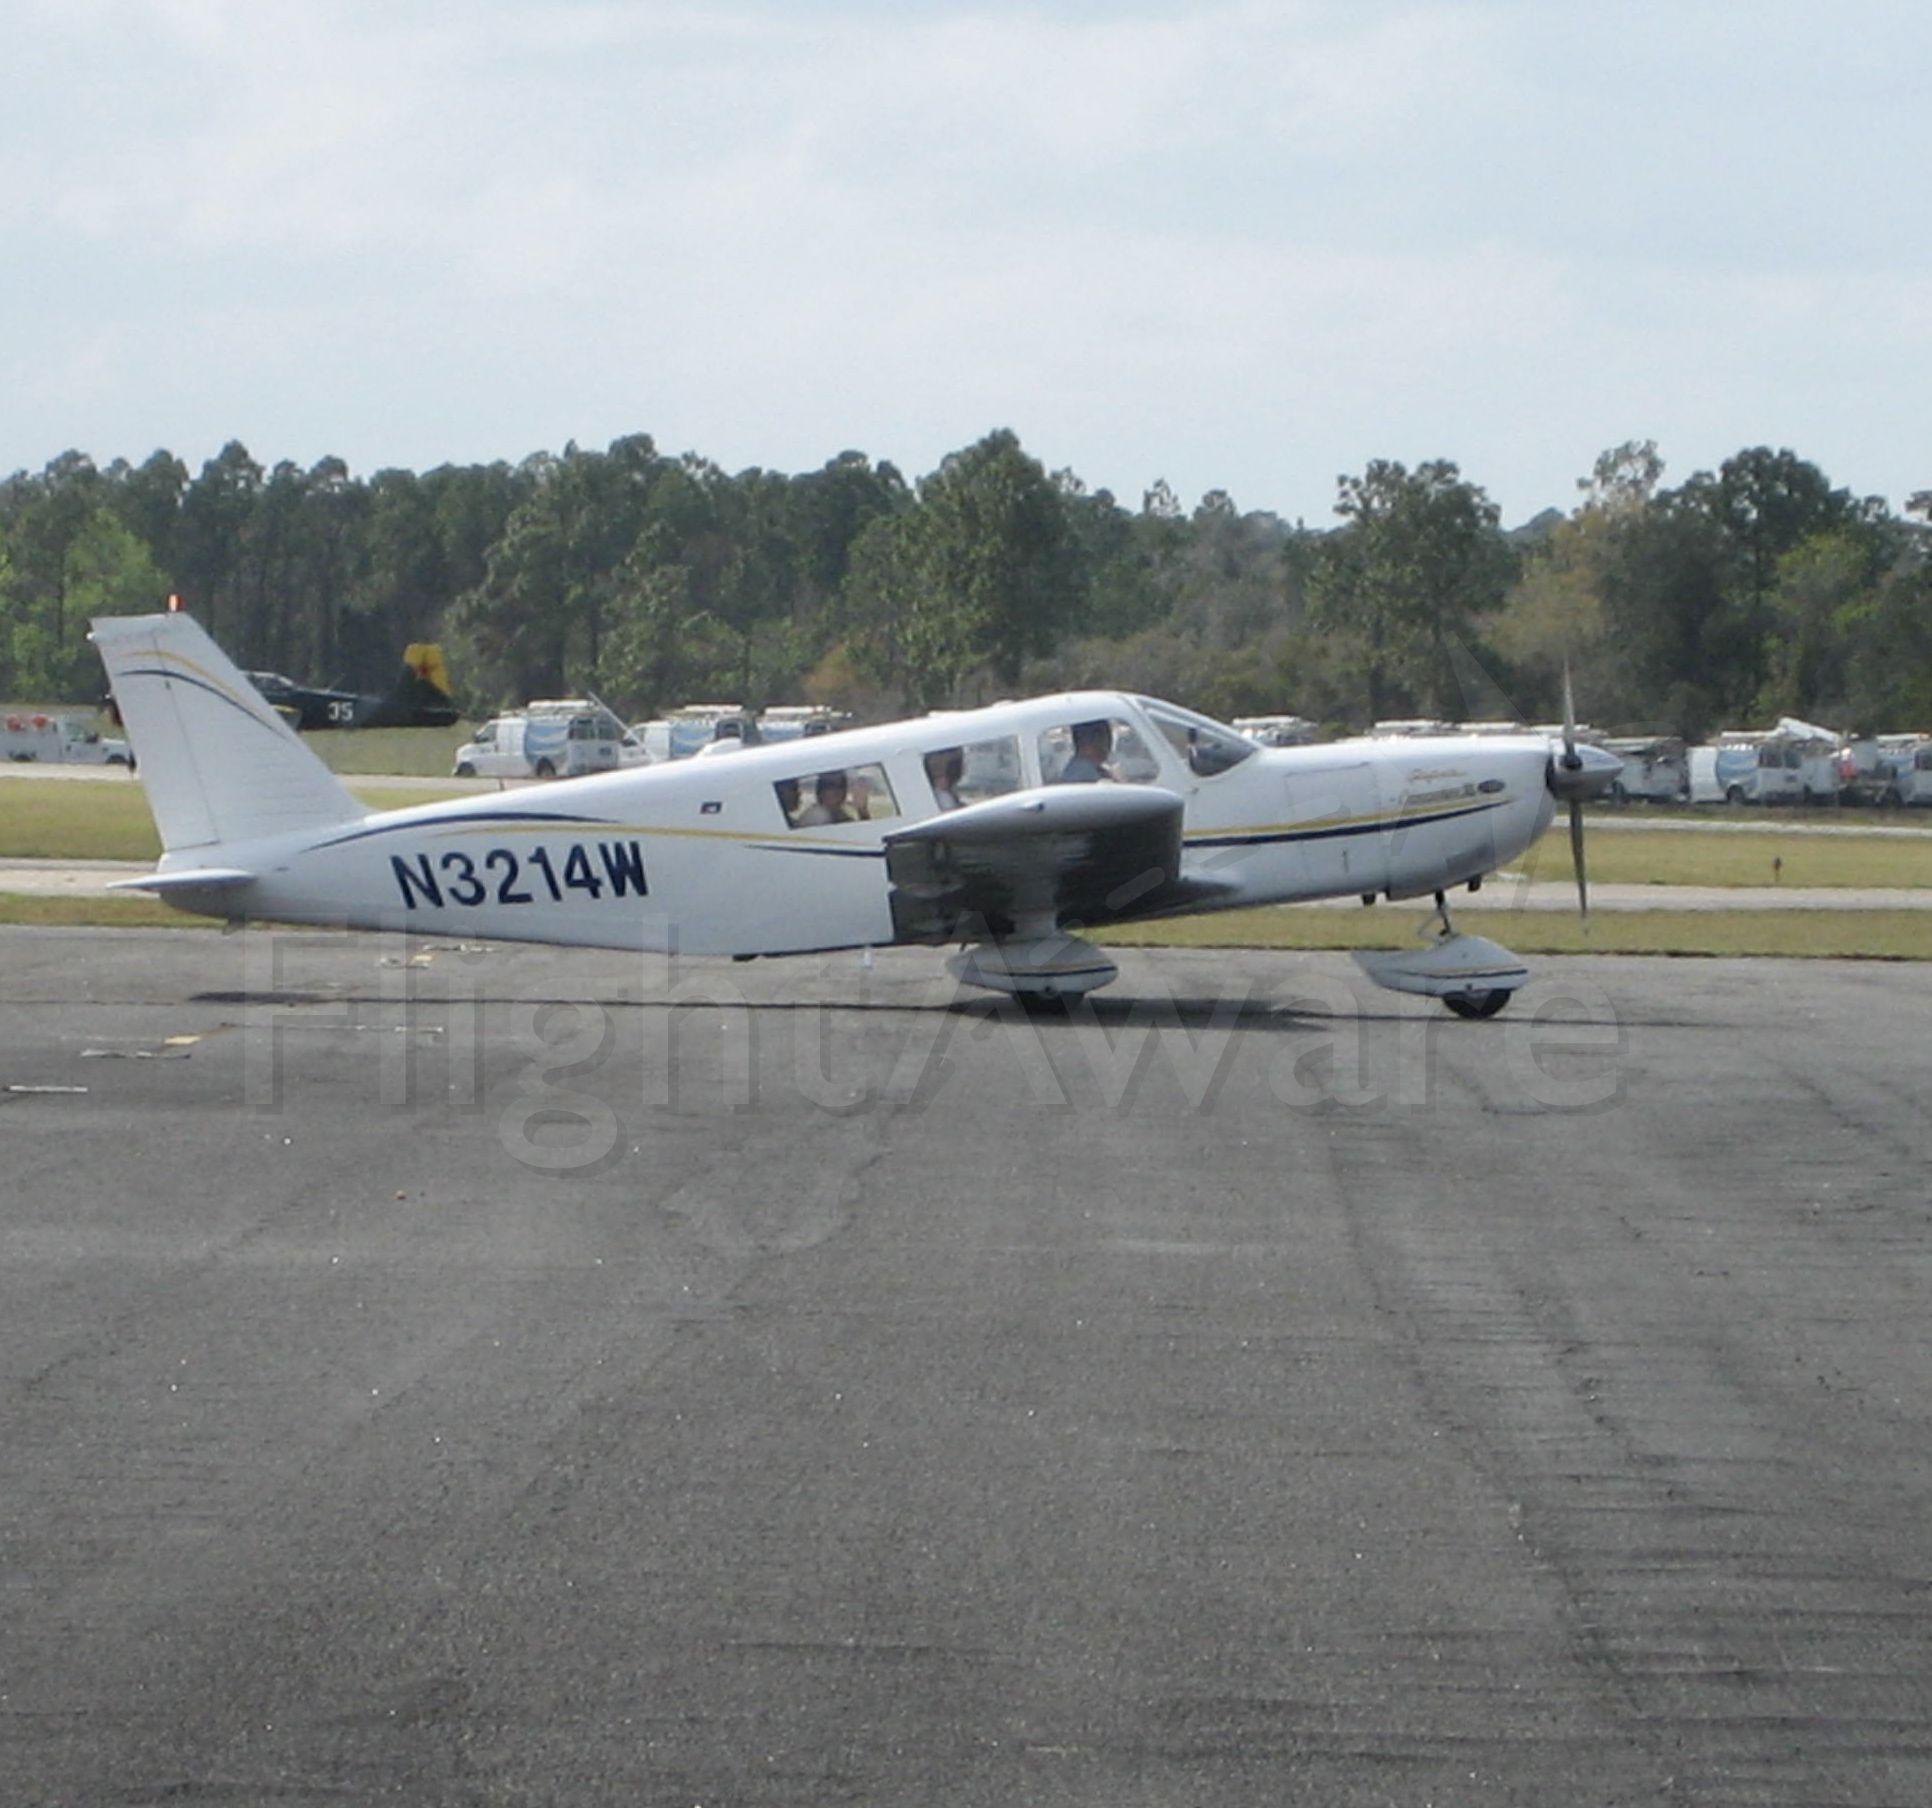 Piper Saratoga (N3214W)